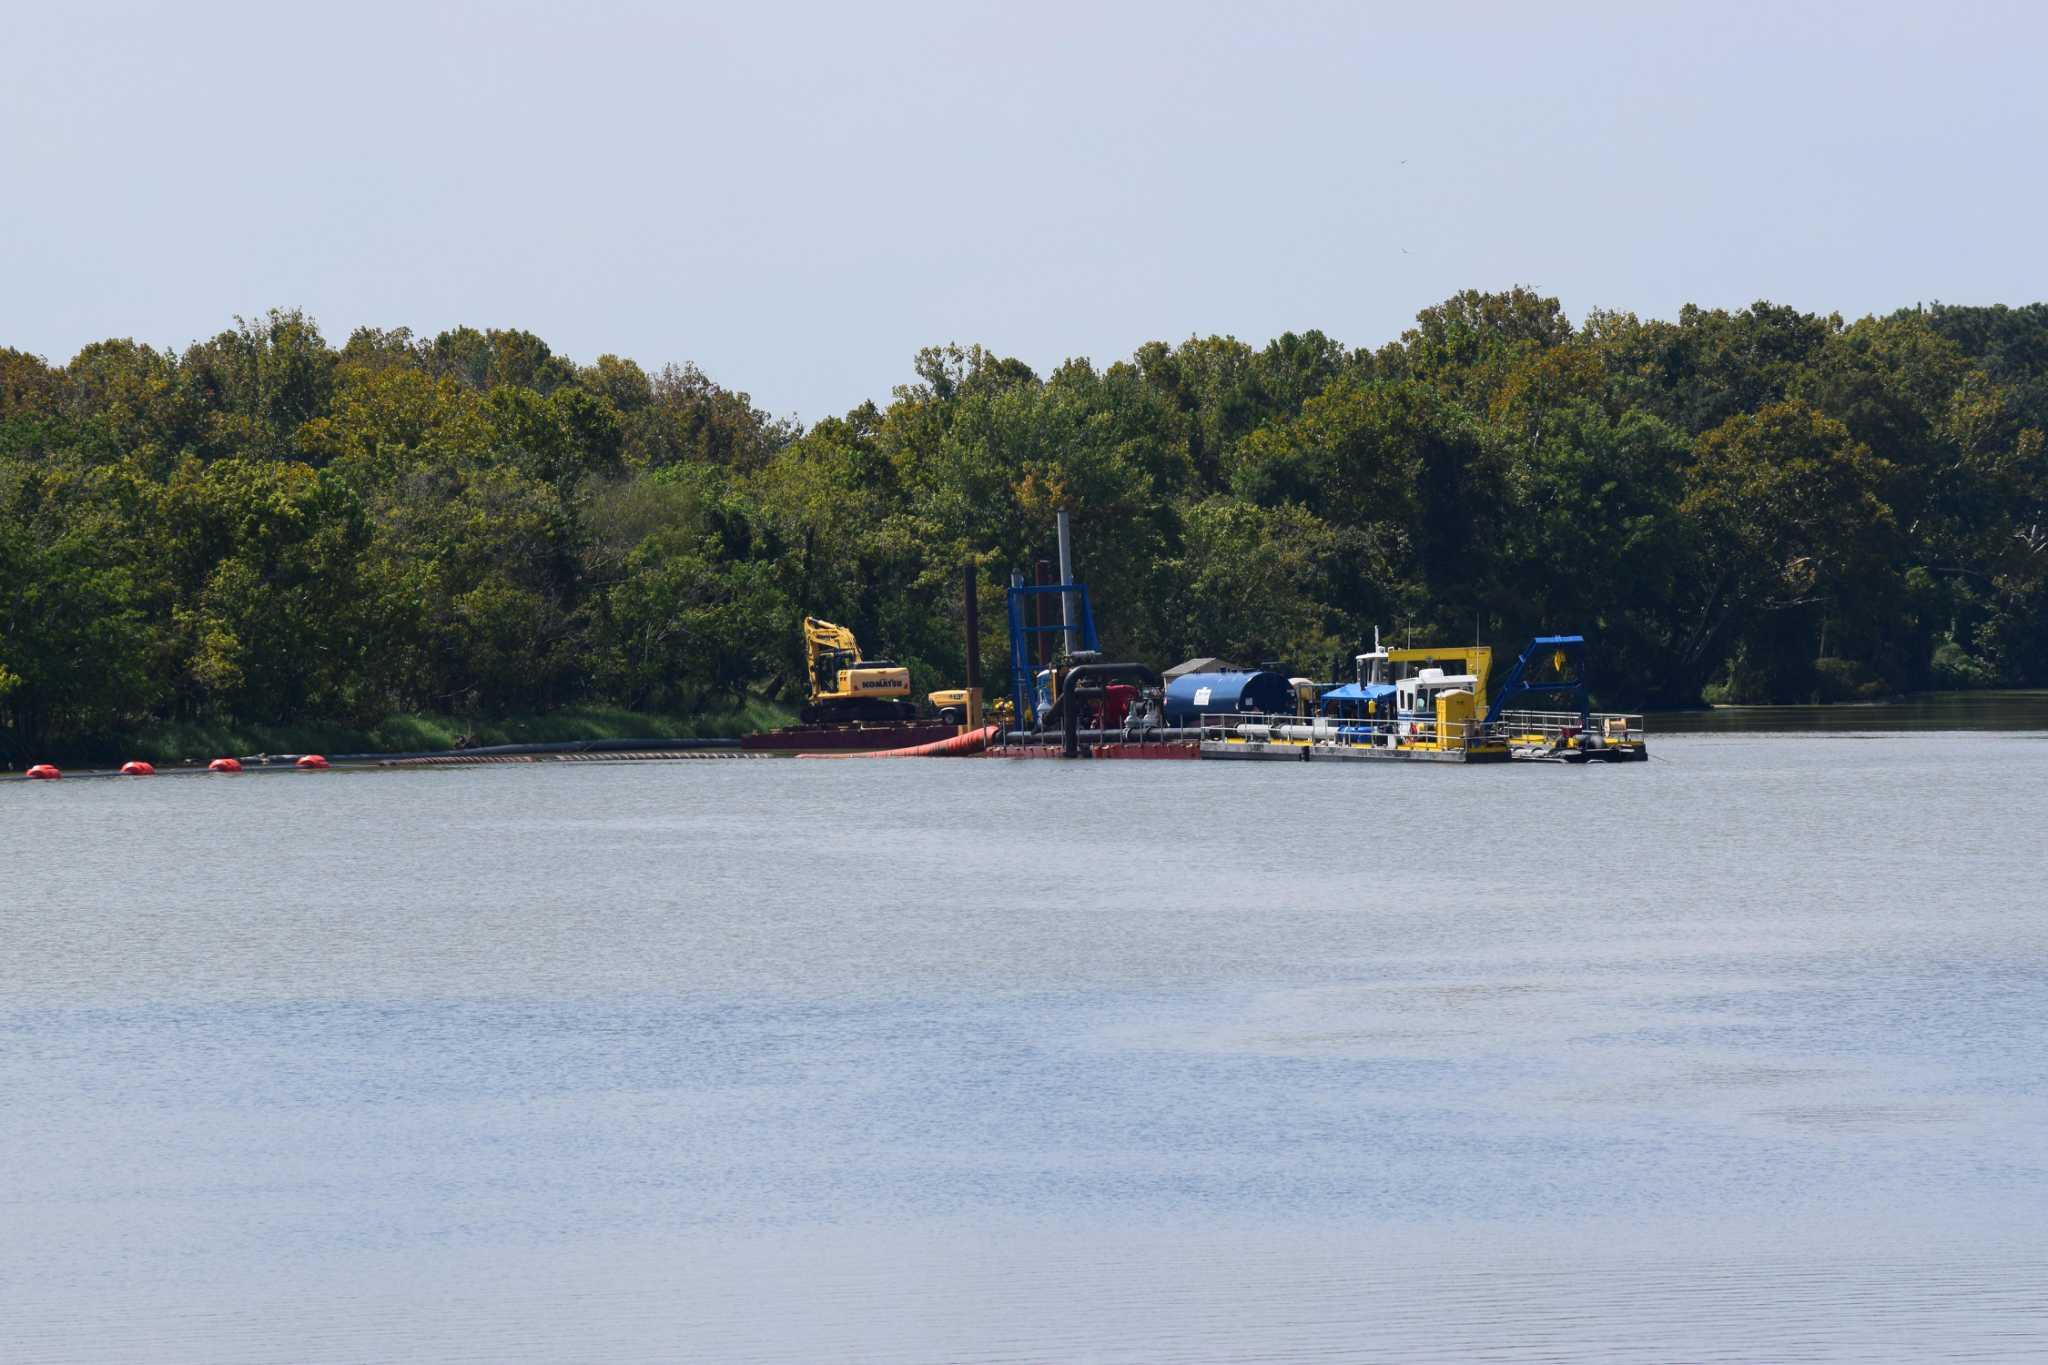 Houston files application to finish dredging Kingwood mouth bar